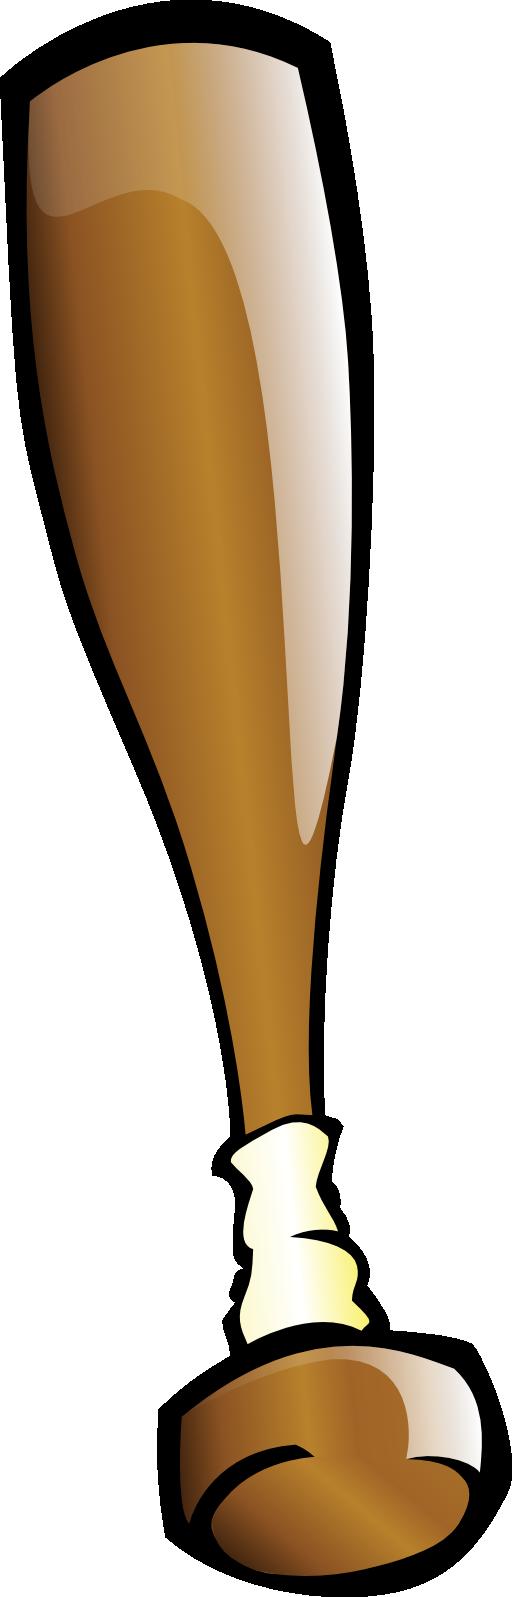 Baseball Bat Clipart - Clipart Kid